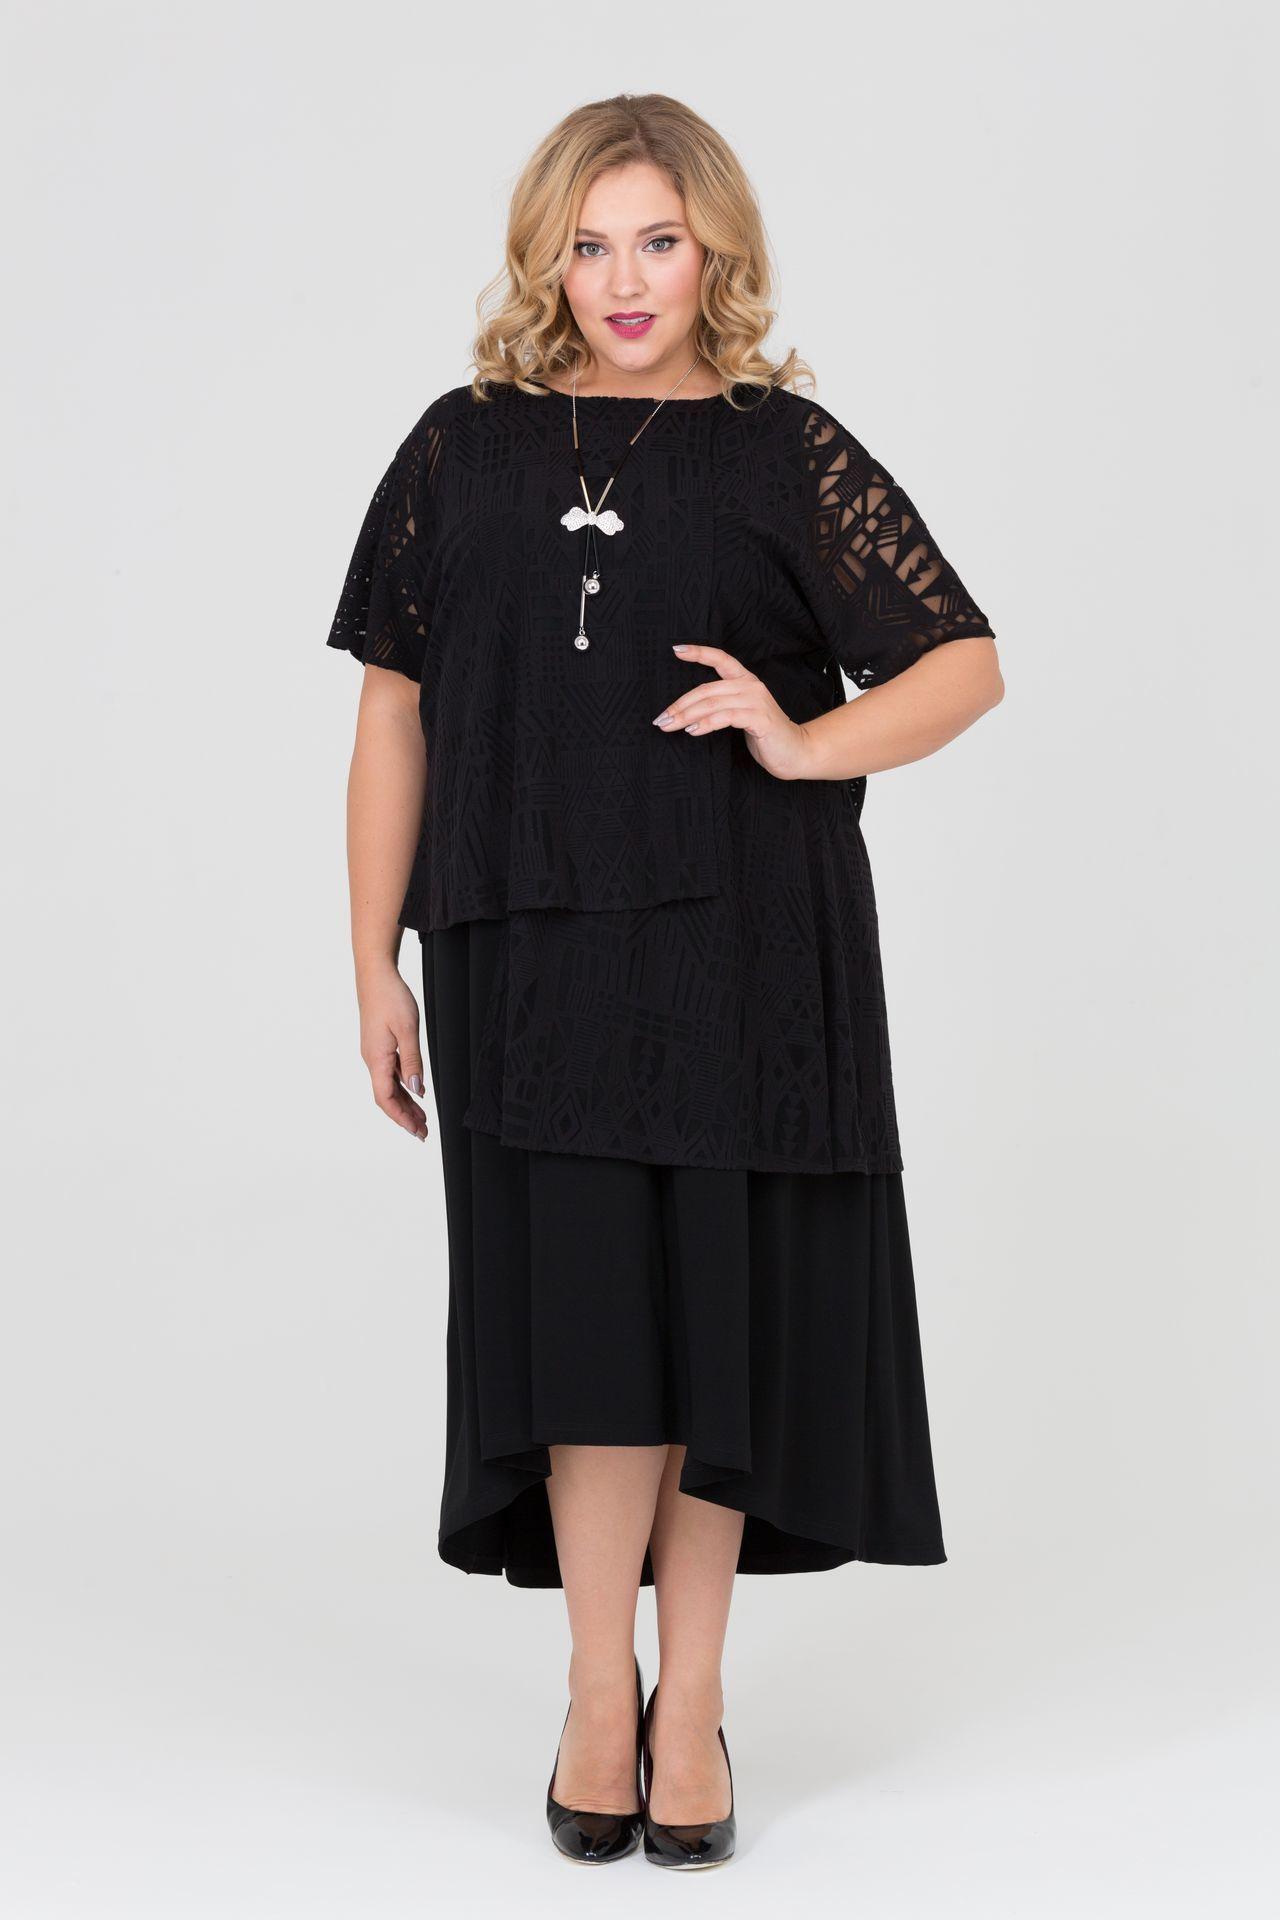 Платья Платье Фиона асимметричного кроя 1742 L img_2492__1_.jpg